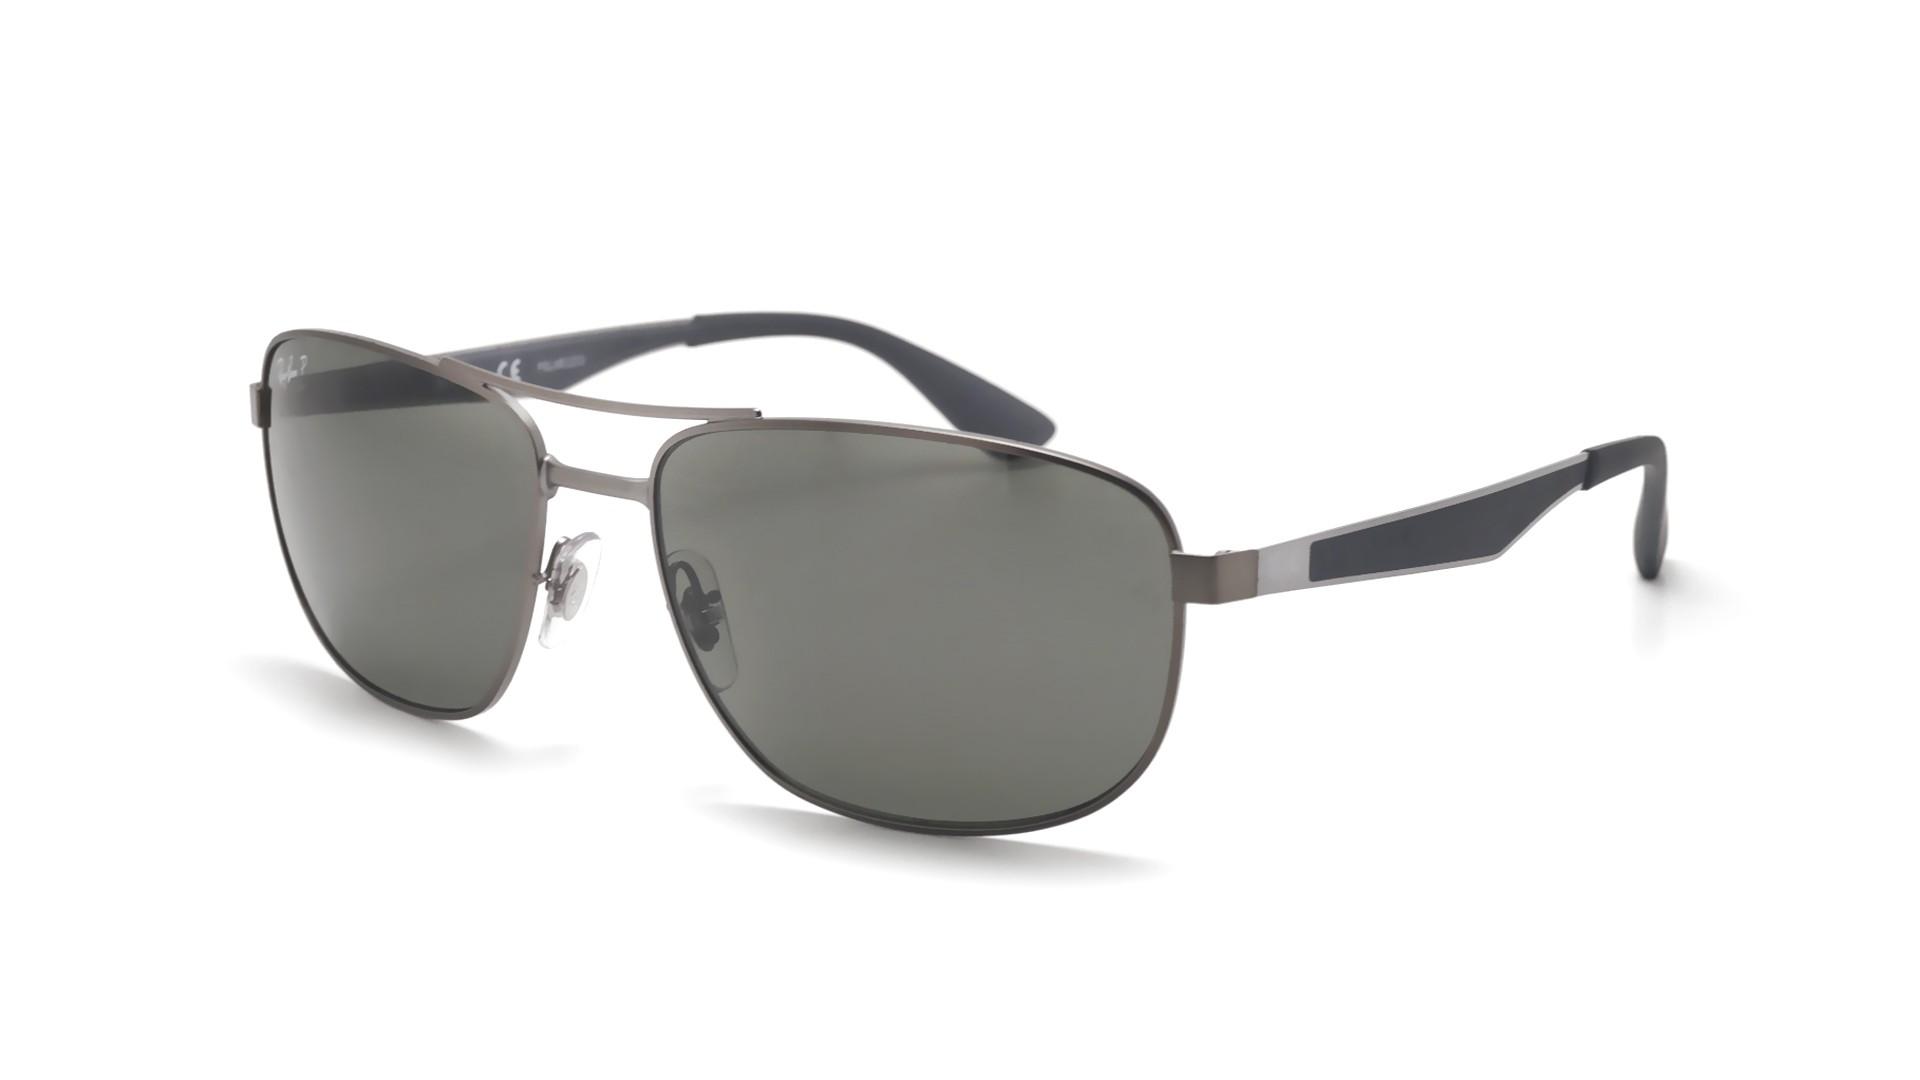 e5f845591ab39 Sunglasses Ray-Ban RB3528 029 9A 61-17 Silver Large Polarized